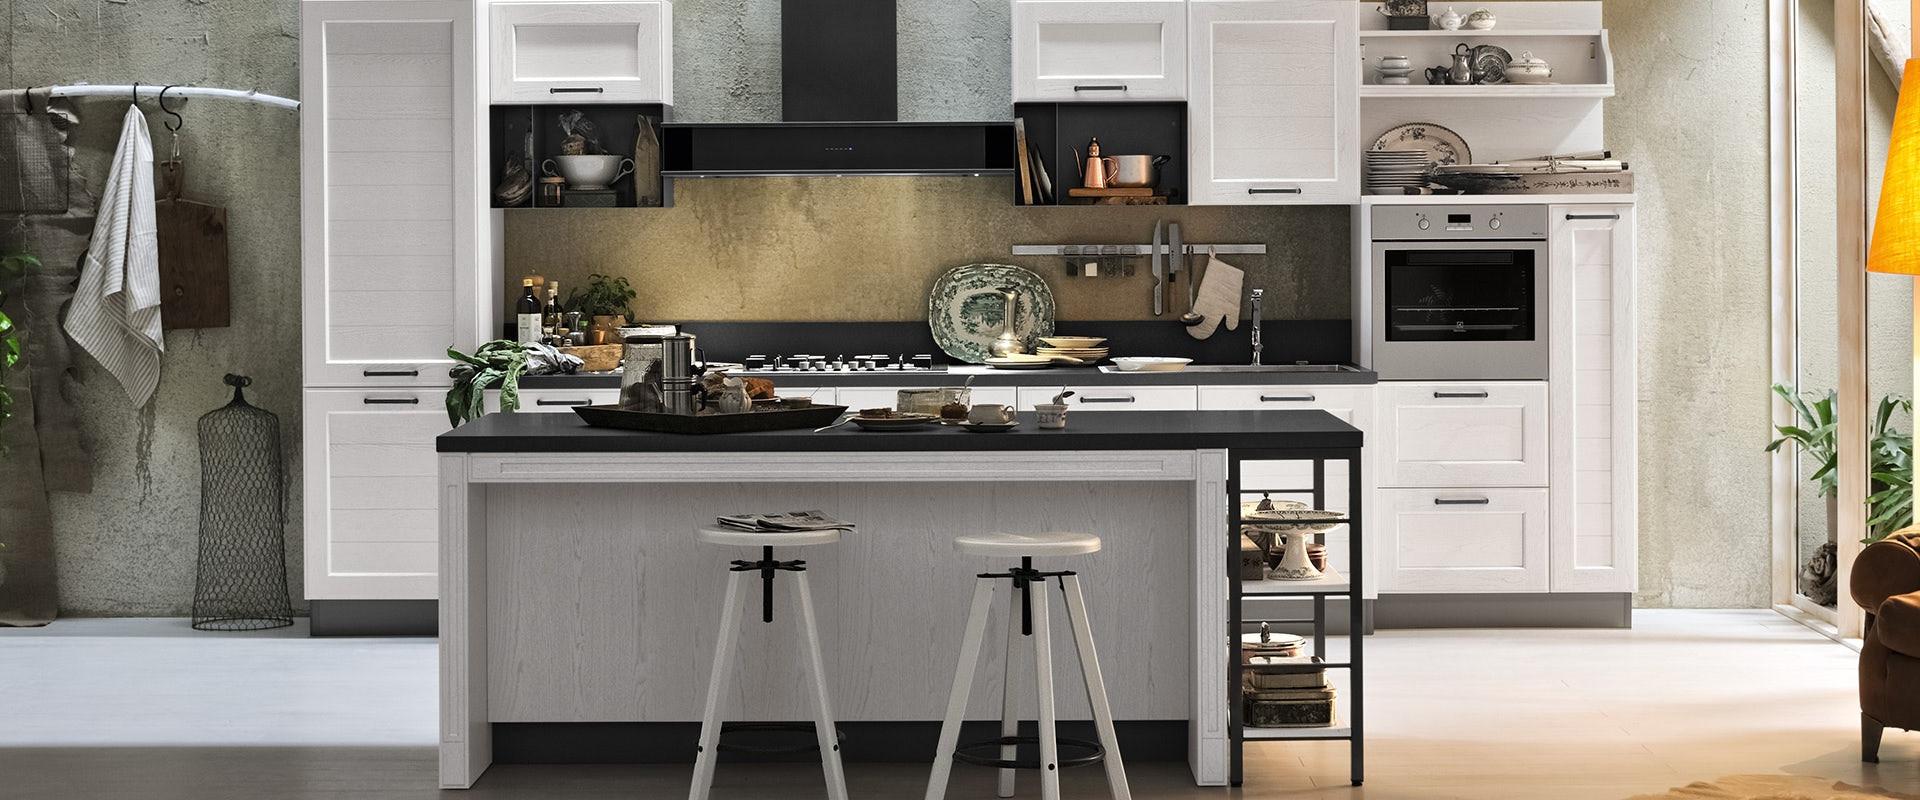 stosa-cucine-classiche-york-222.jpg